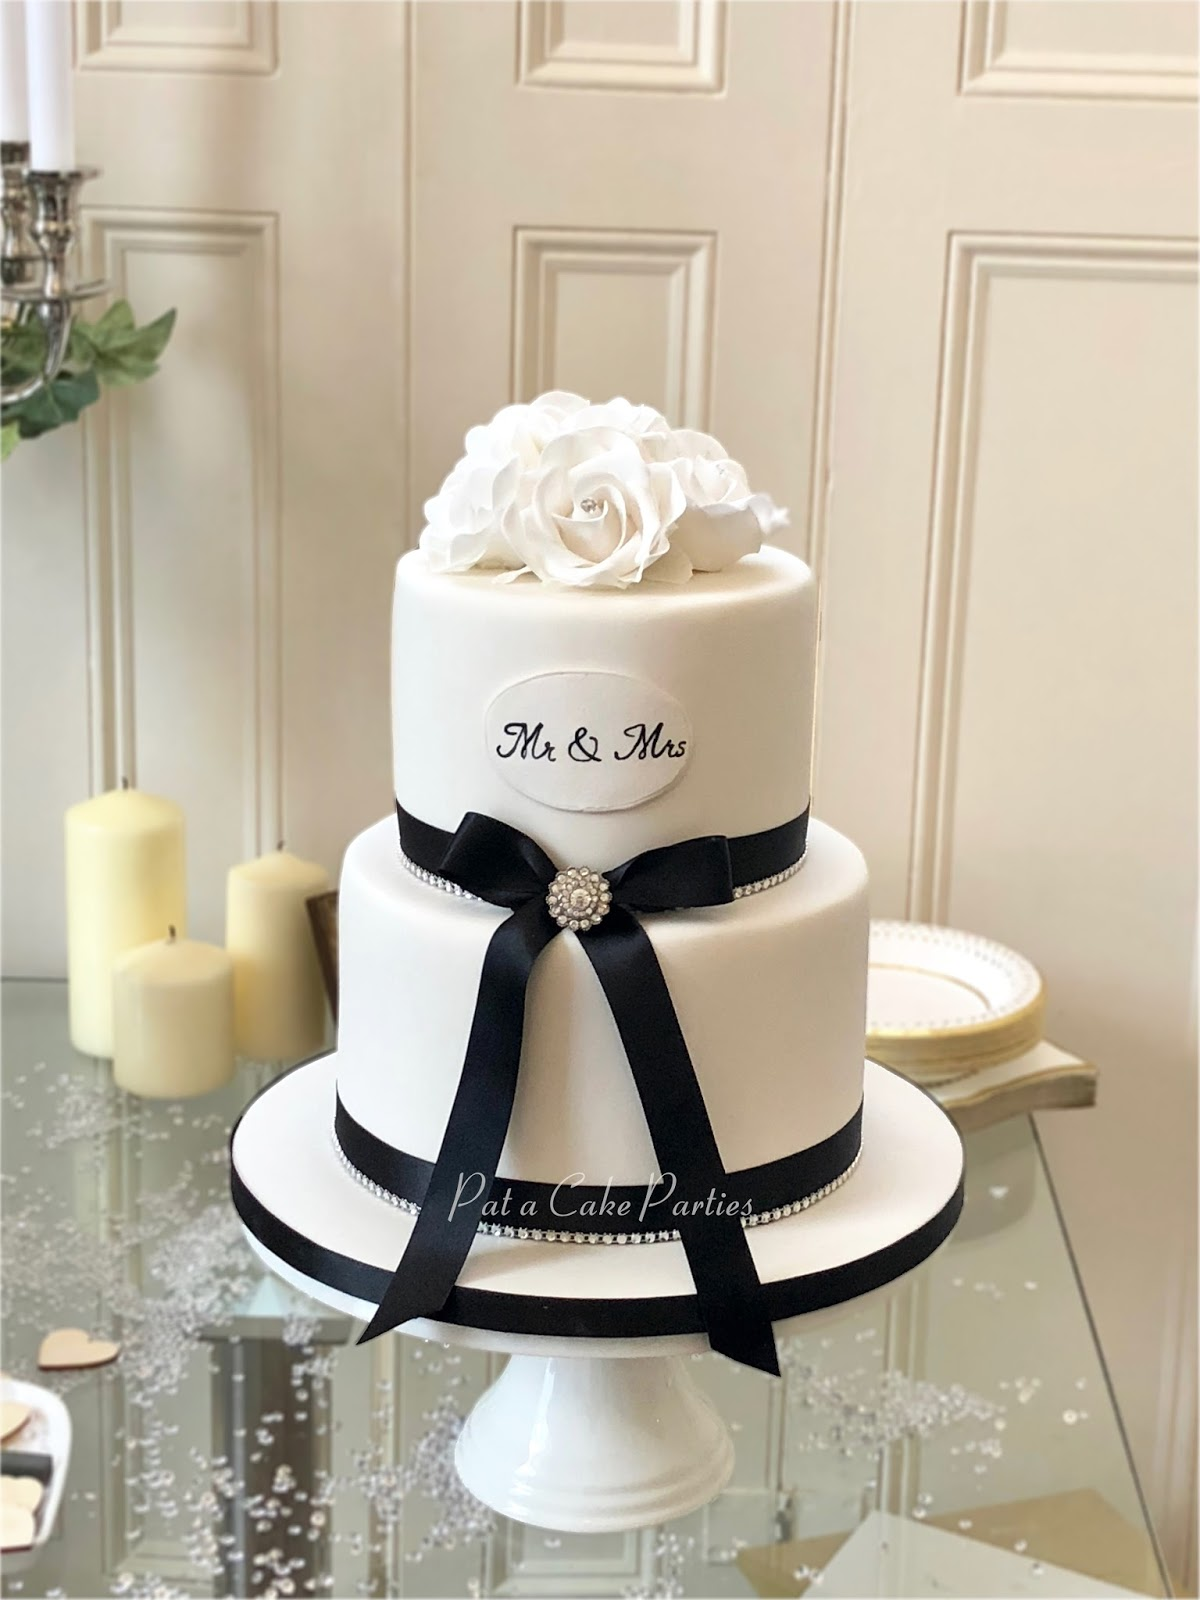 Pat-a-Cake Parties: Wedding Cake